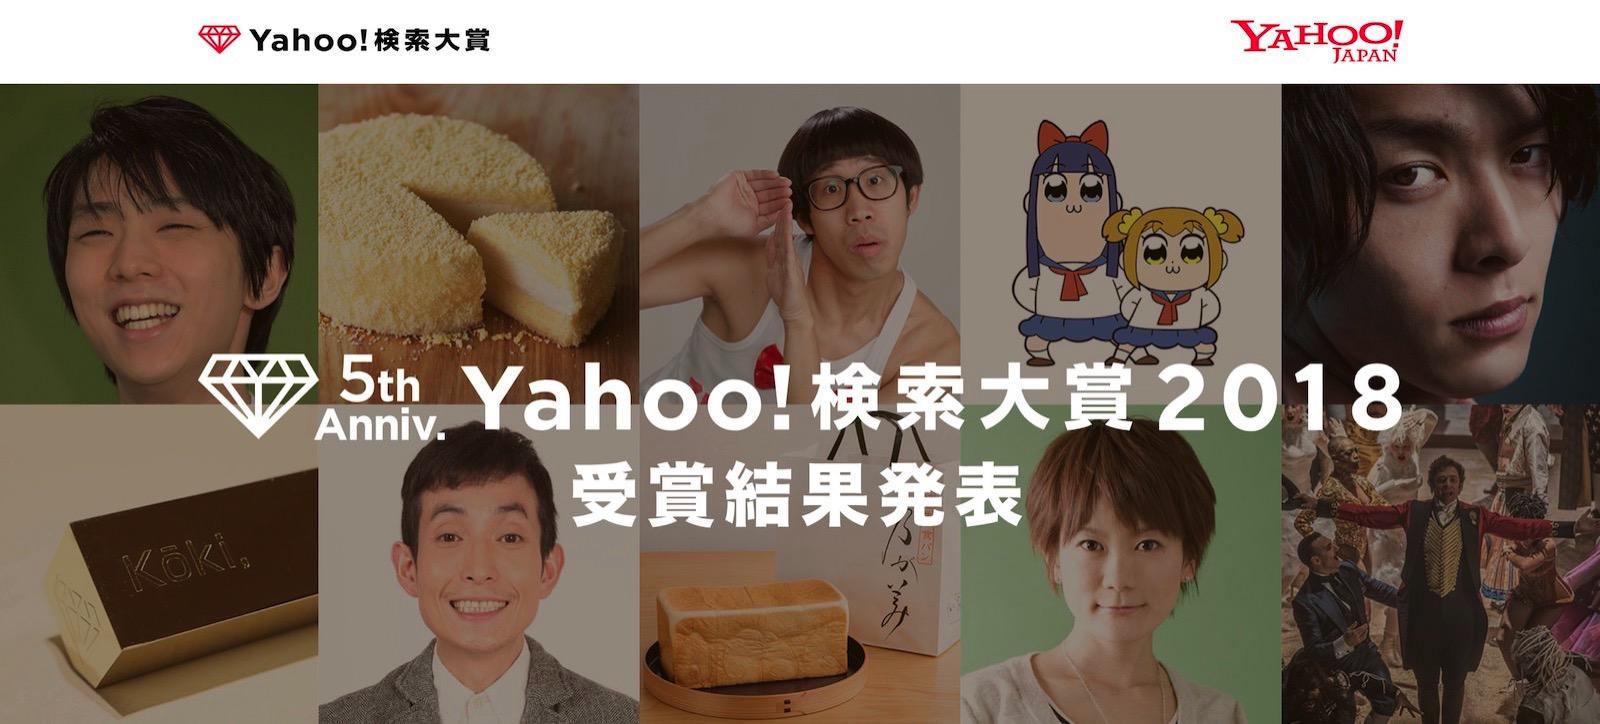 Yahoo Search 2018